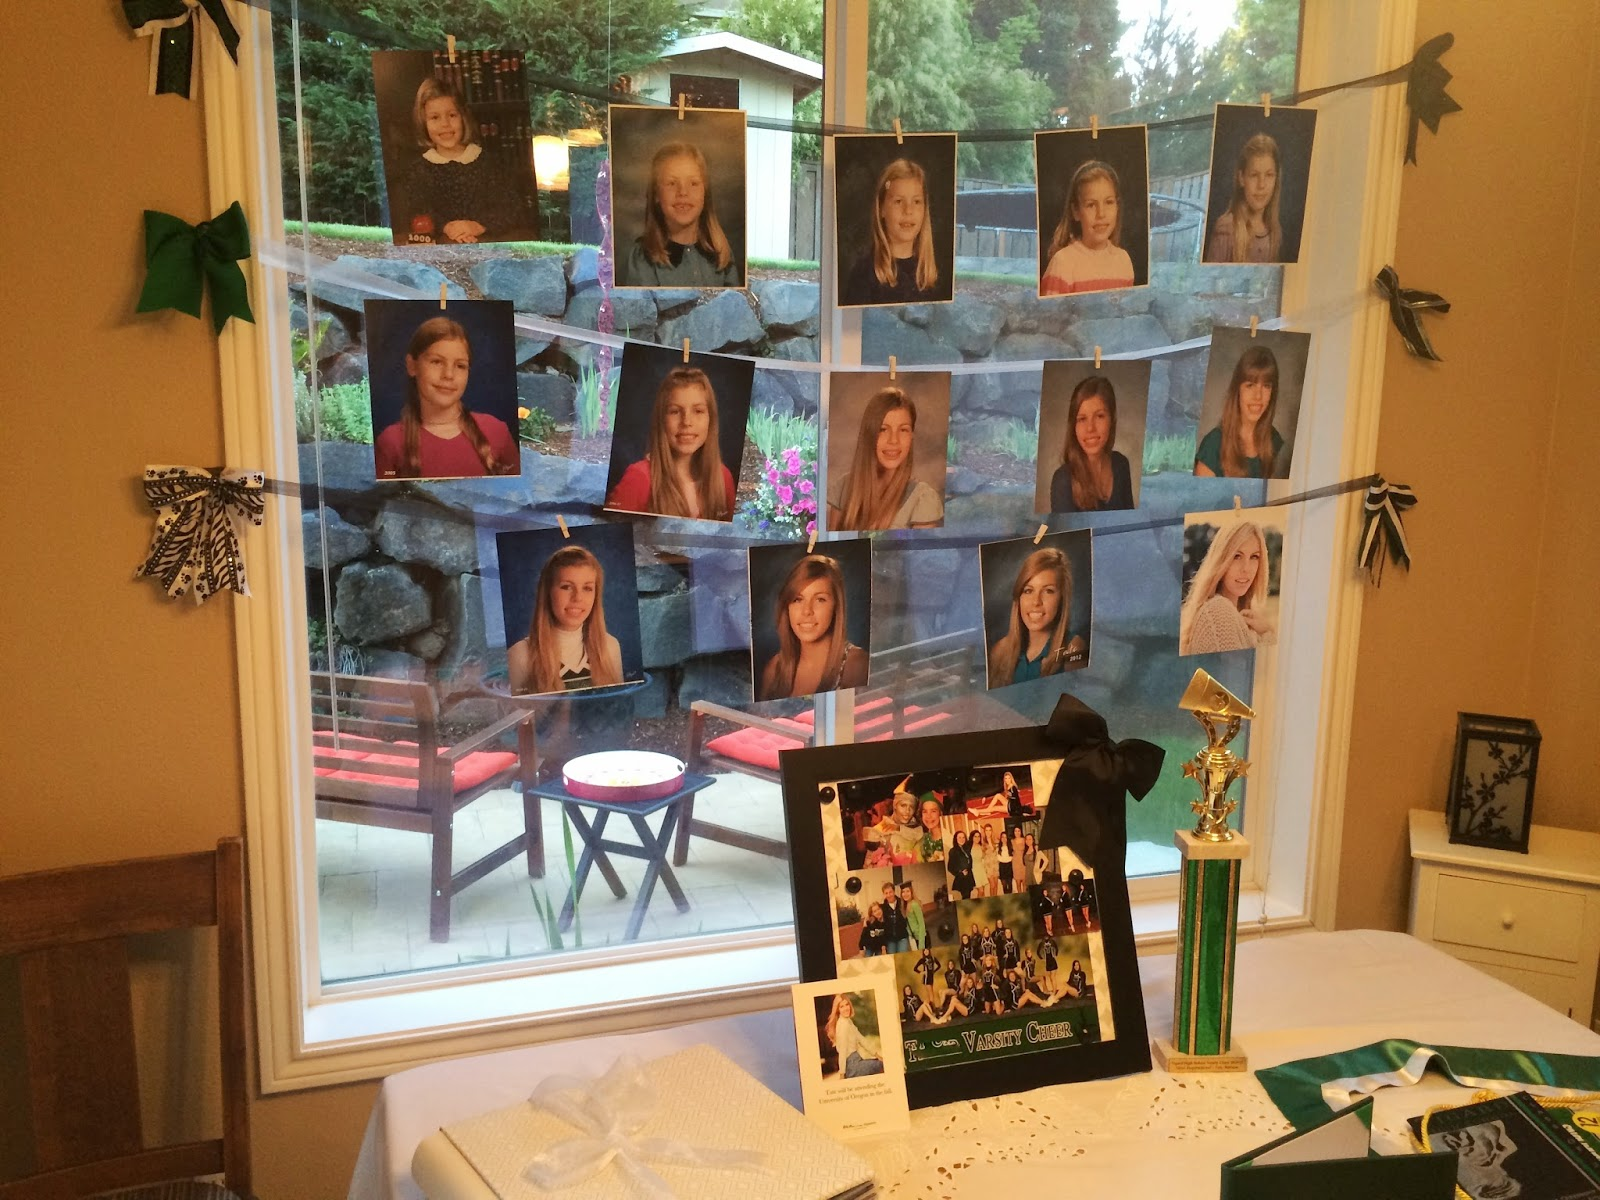 a dash of scraps: High School Graduation Party Photo Displays